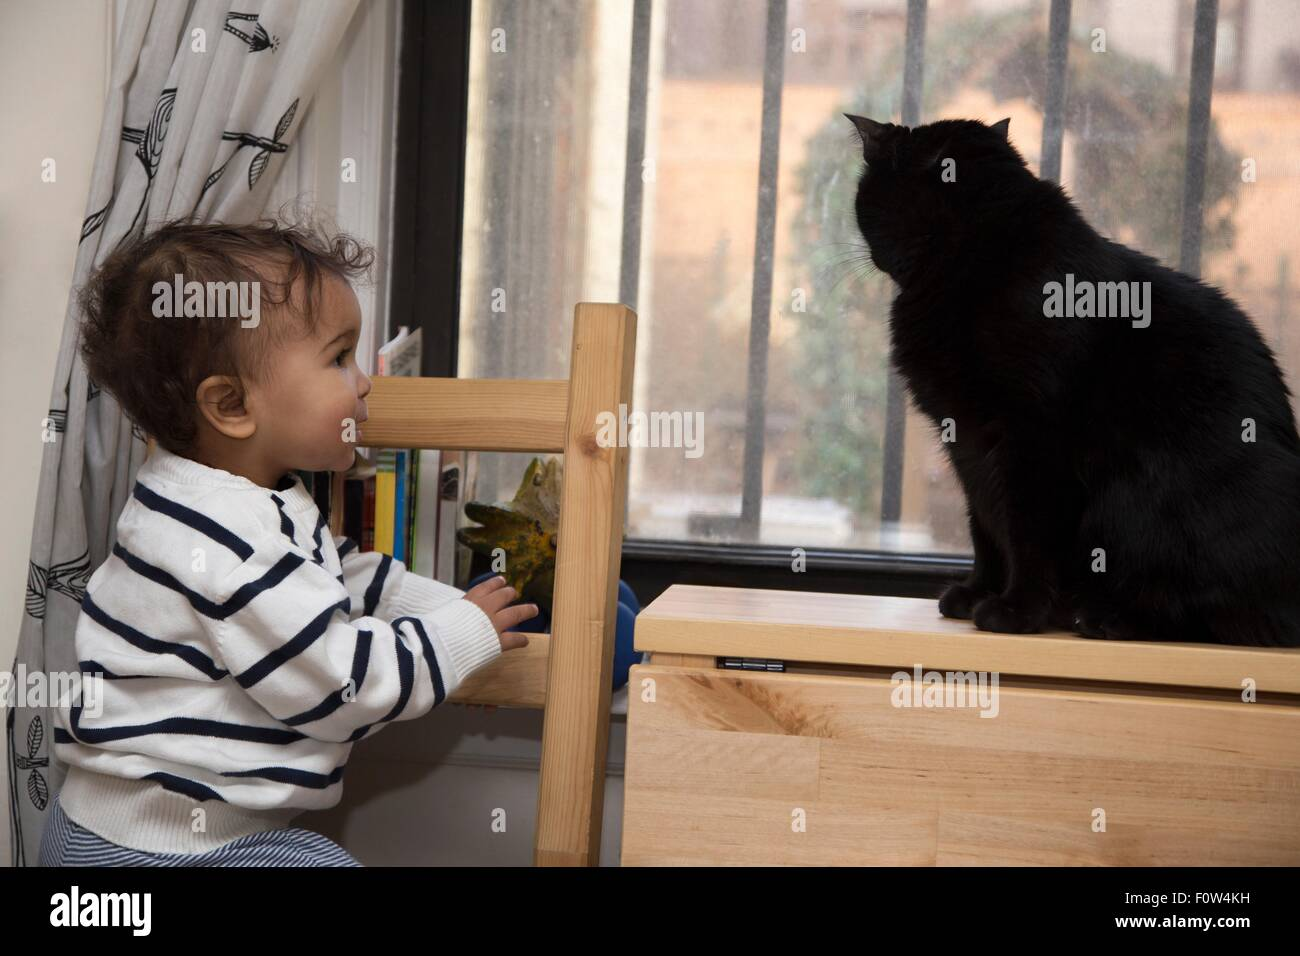 Portrait of female toddler watching cat on windowsill - Stock Image